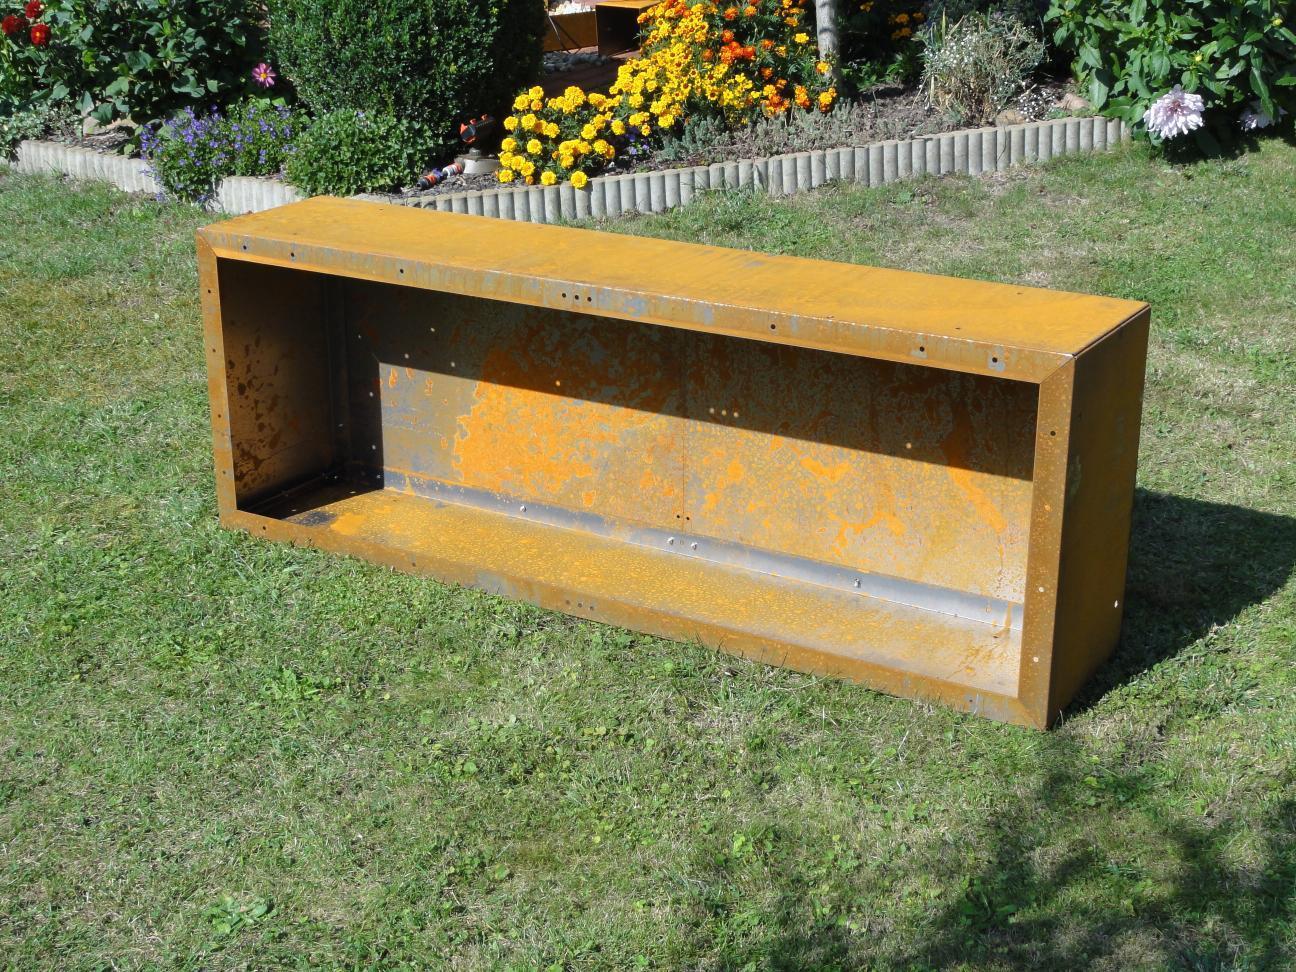 r ckwand f r kaminholzregal 1 7m x 1 2m corten edelrost. Black Bedroom Furniture Sets. Home Design Ideas